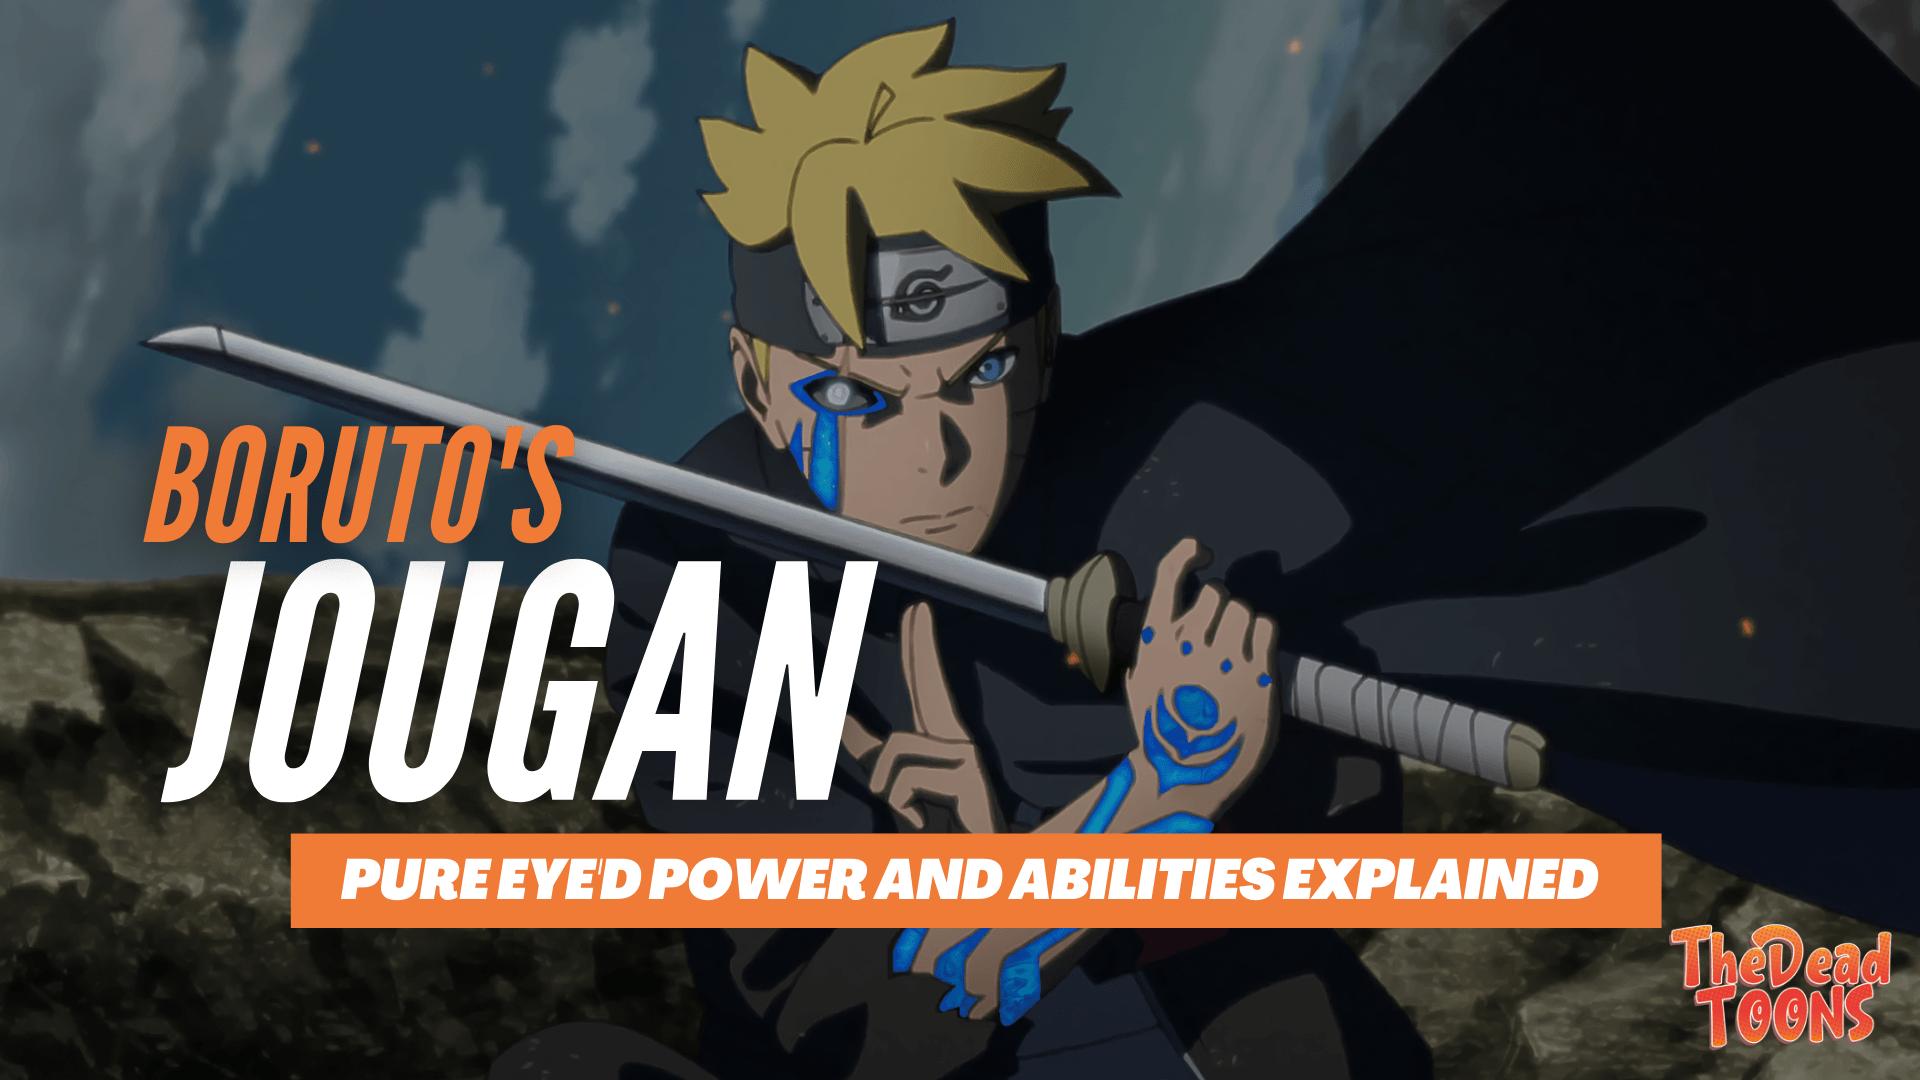 Boruto's Jougan Pure Eye DOJUTSU Power and Abilities Explained